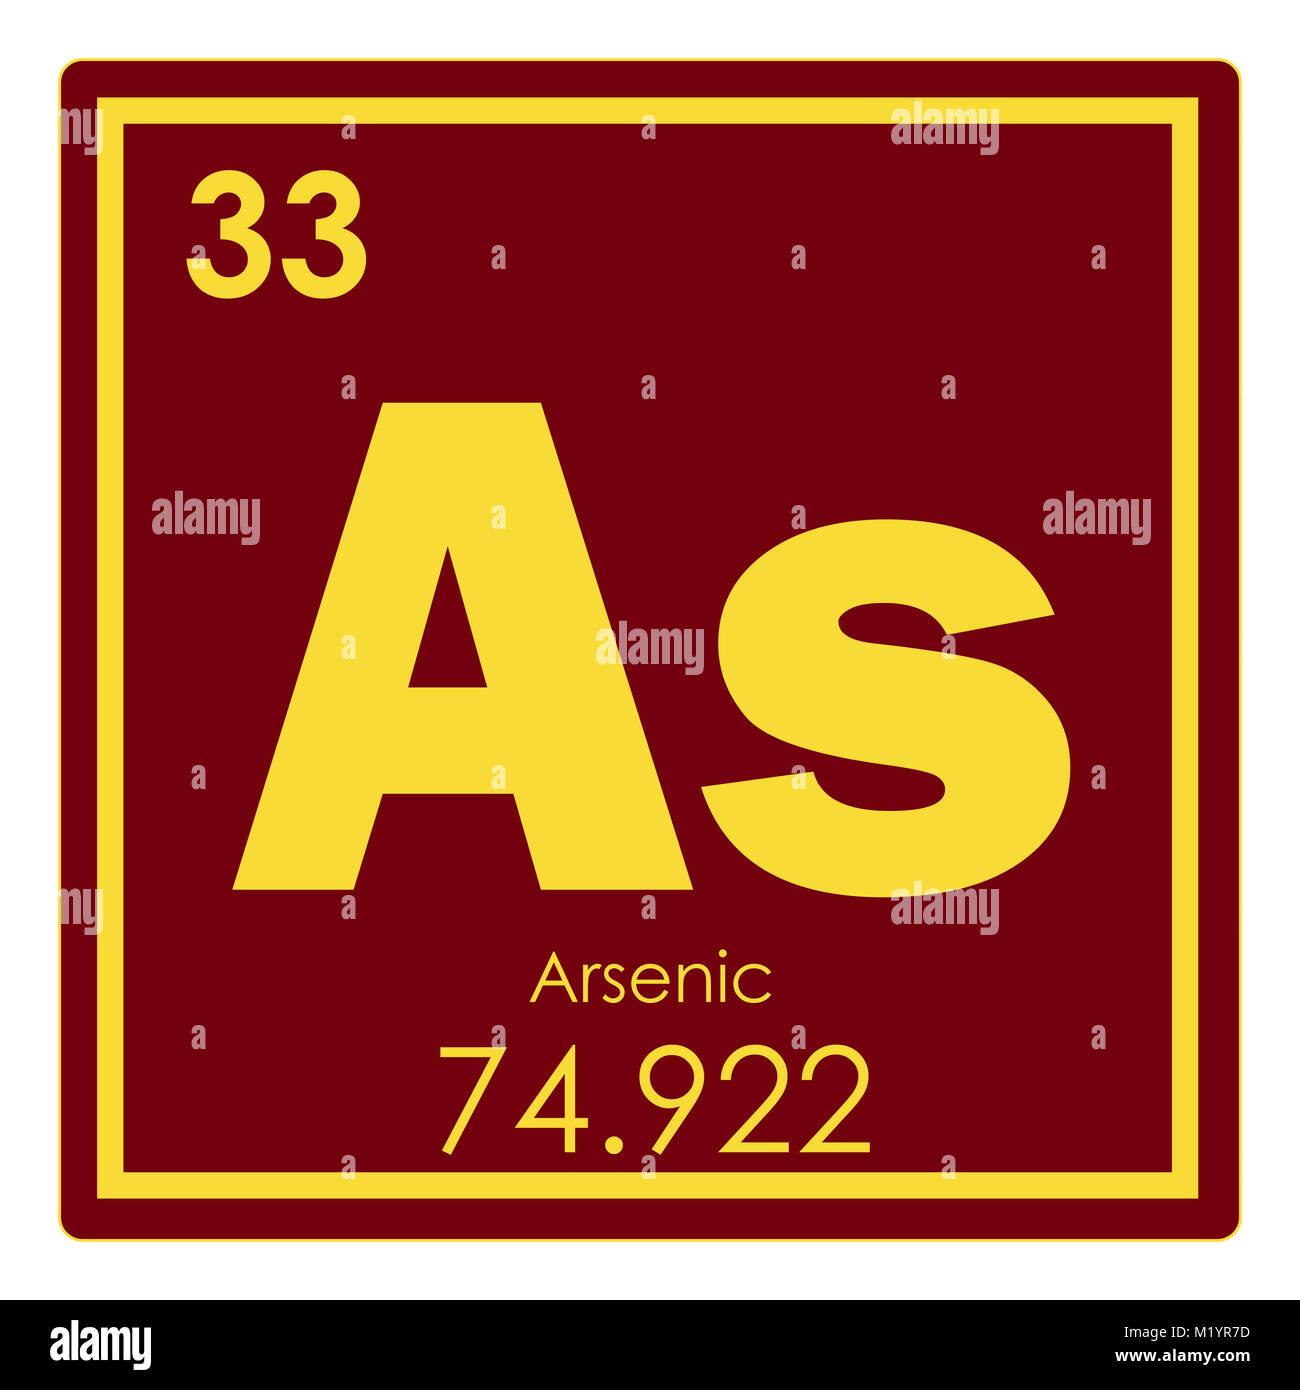 Arsenic Chemical Element Stock Photos Arsenic Chemical Element